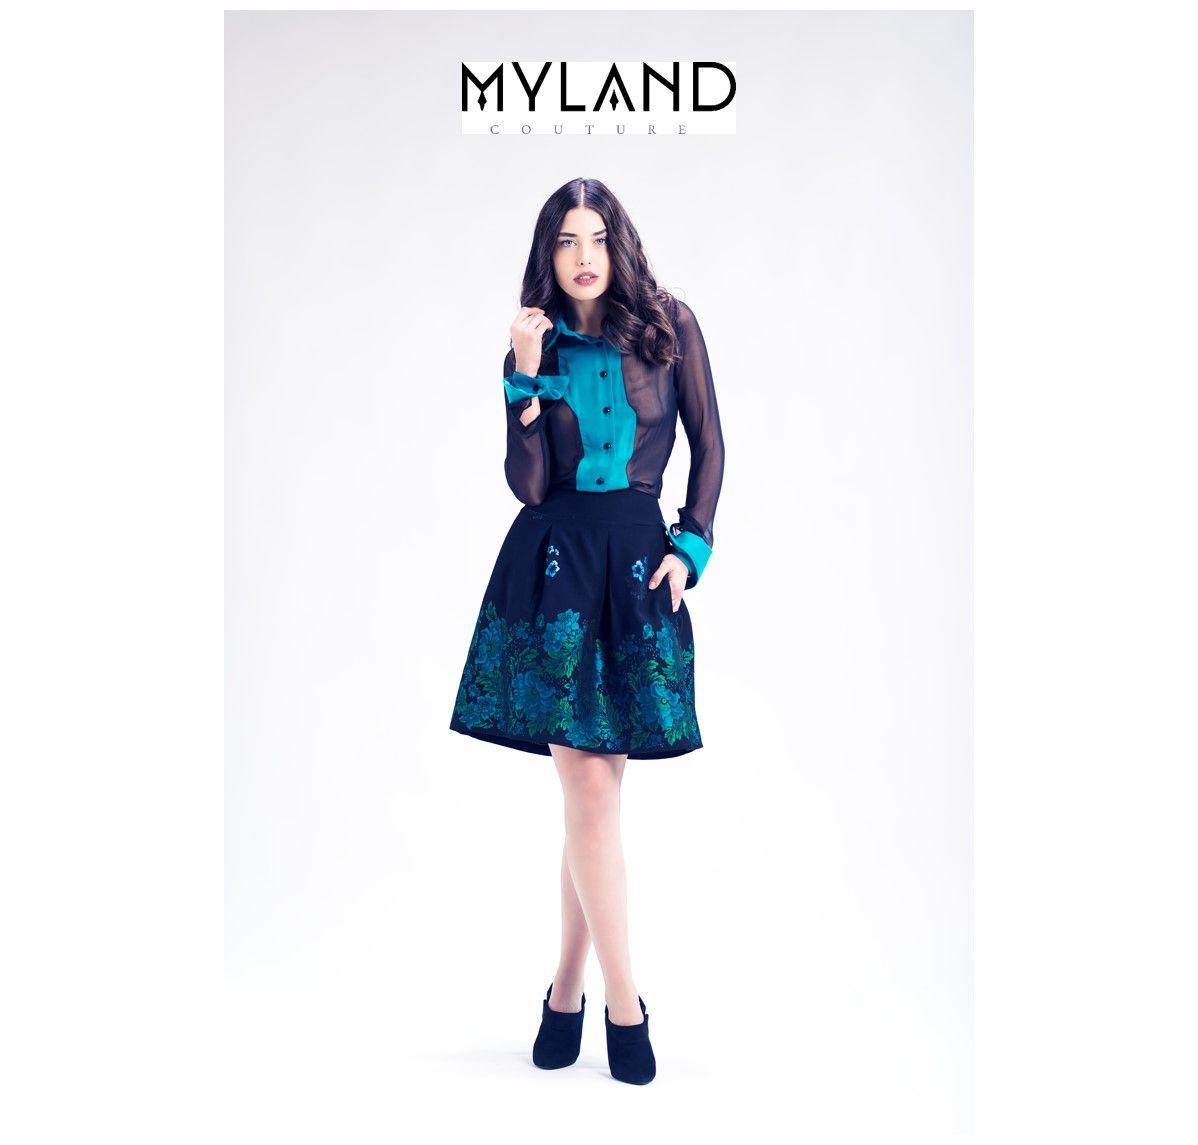 Potencia tu feminidad con Myland Couture www.mylandcouture.coom #fashionblogger #blog #blogger #moda #fashion #exclusive #mylandcouture #altacostura #pretacouture #estylish #cool #beautiful #abrigo #coat #woman #mujer #girl #barcelona #tekton #aw15 #fw15